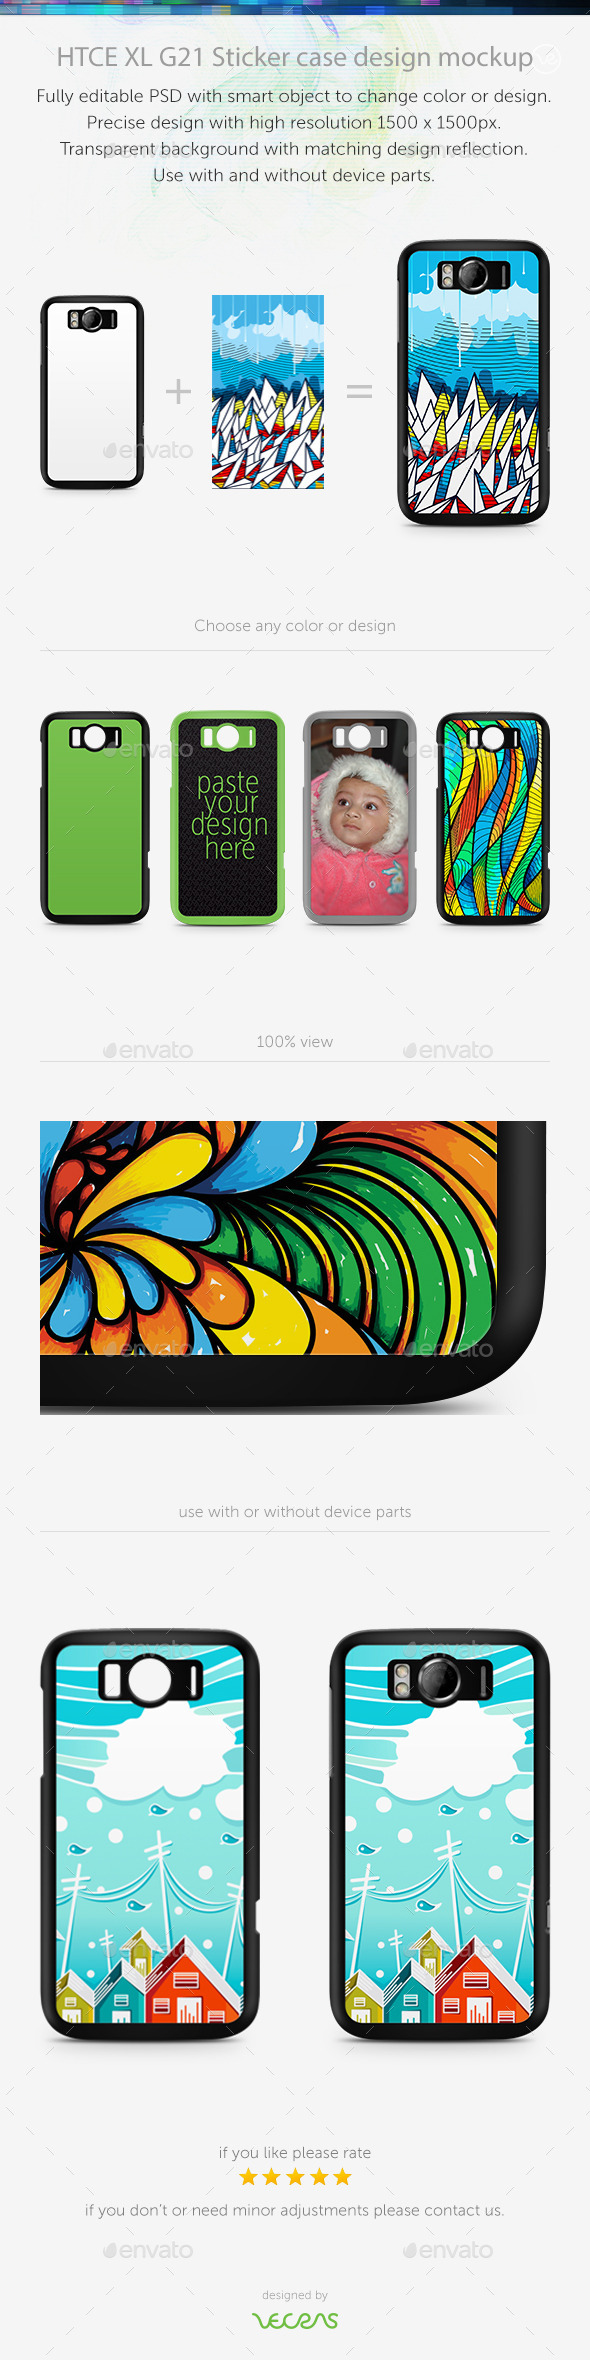 HTCE XL G21 Sticker Case Design Mockup